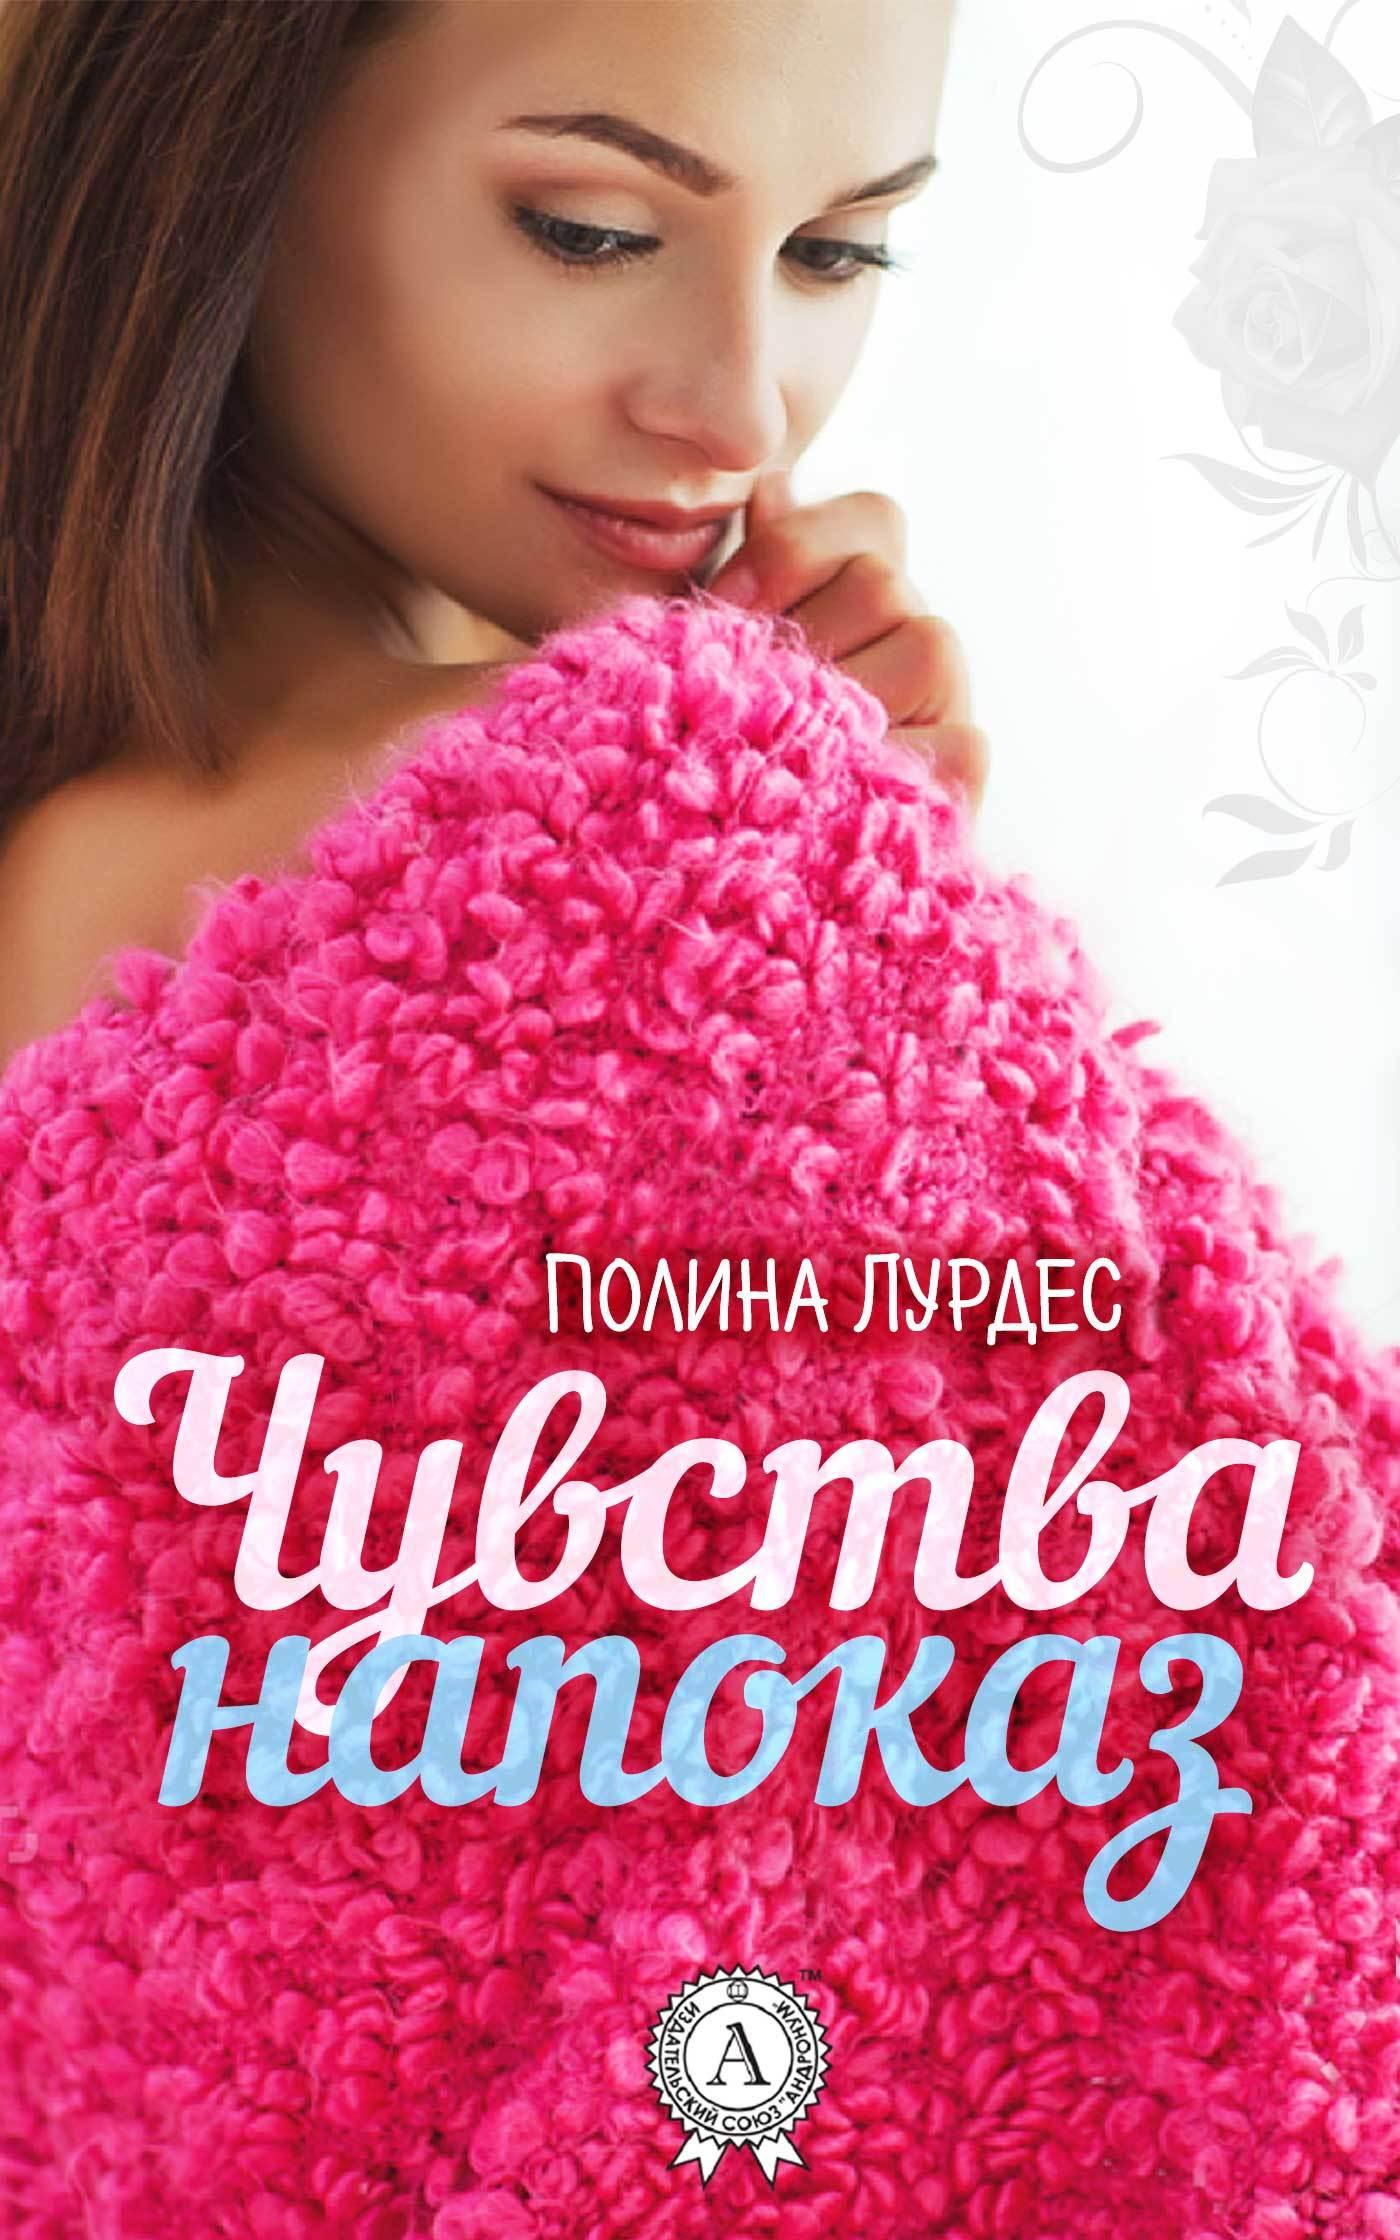 Полина Лурдес - Чувства напоказ